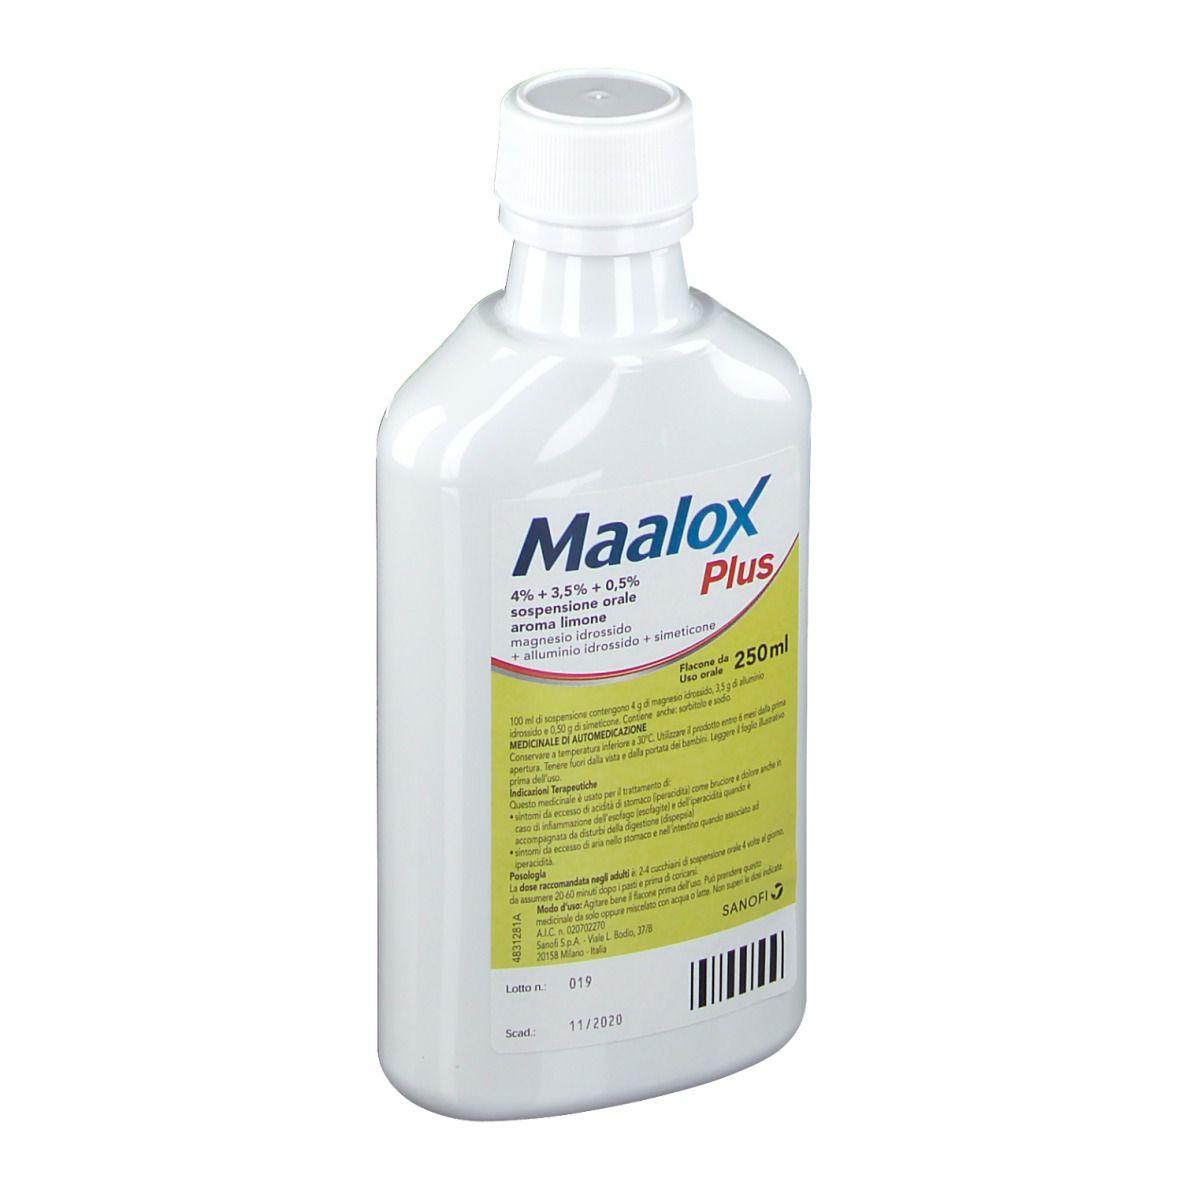 MAALOX PLUS*OS SOSP 4+3,5+0,5% - Speedyfarma.it